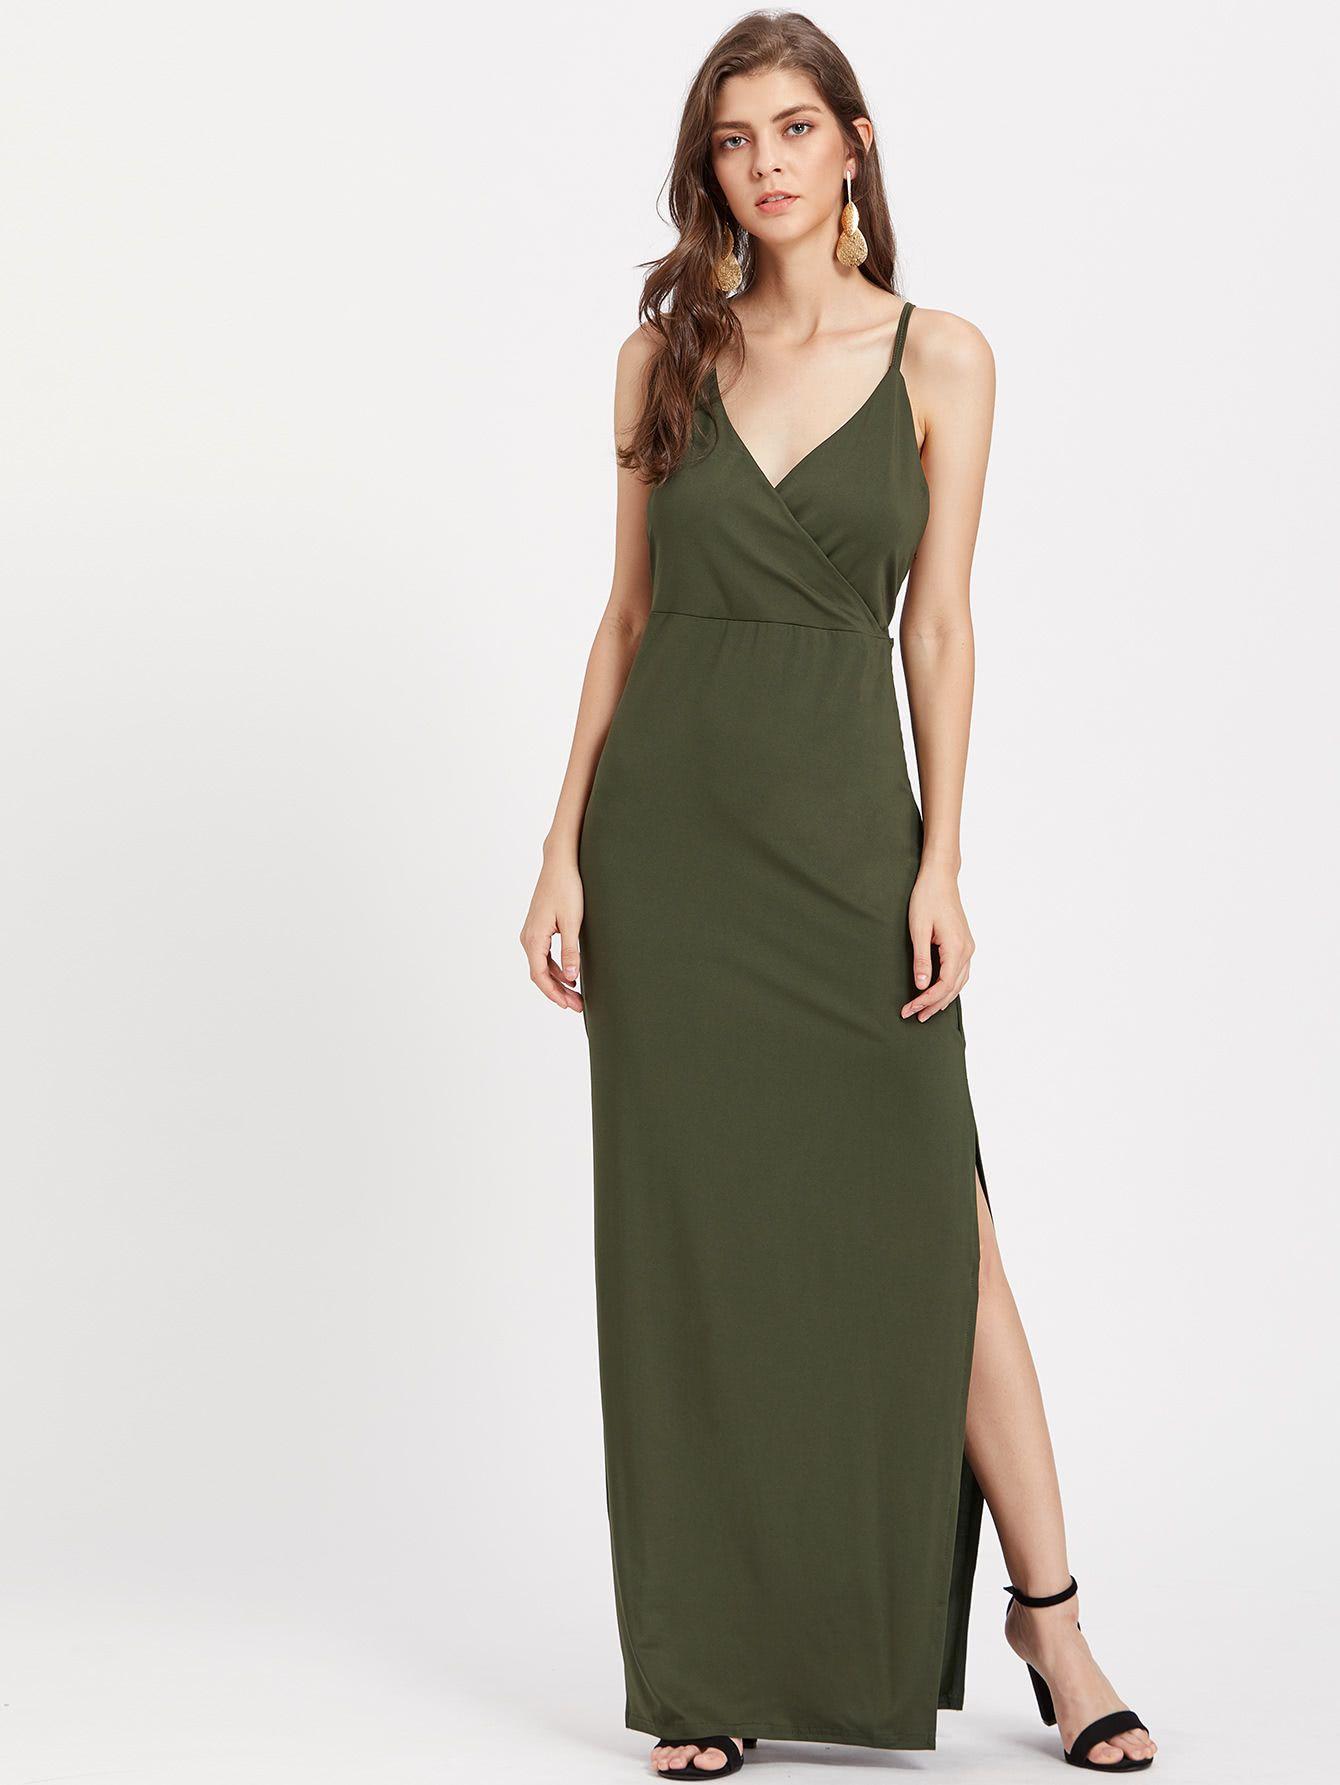 ef82468efe SheIn Surplice Neckline Slit Side Cami Dress | The Style Perk ...